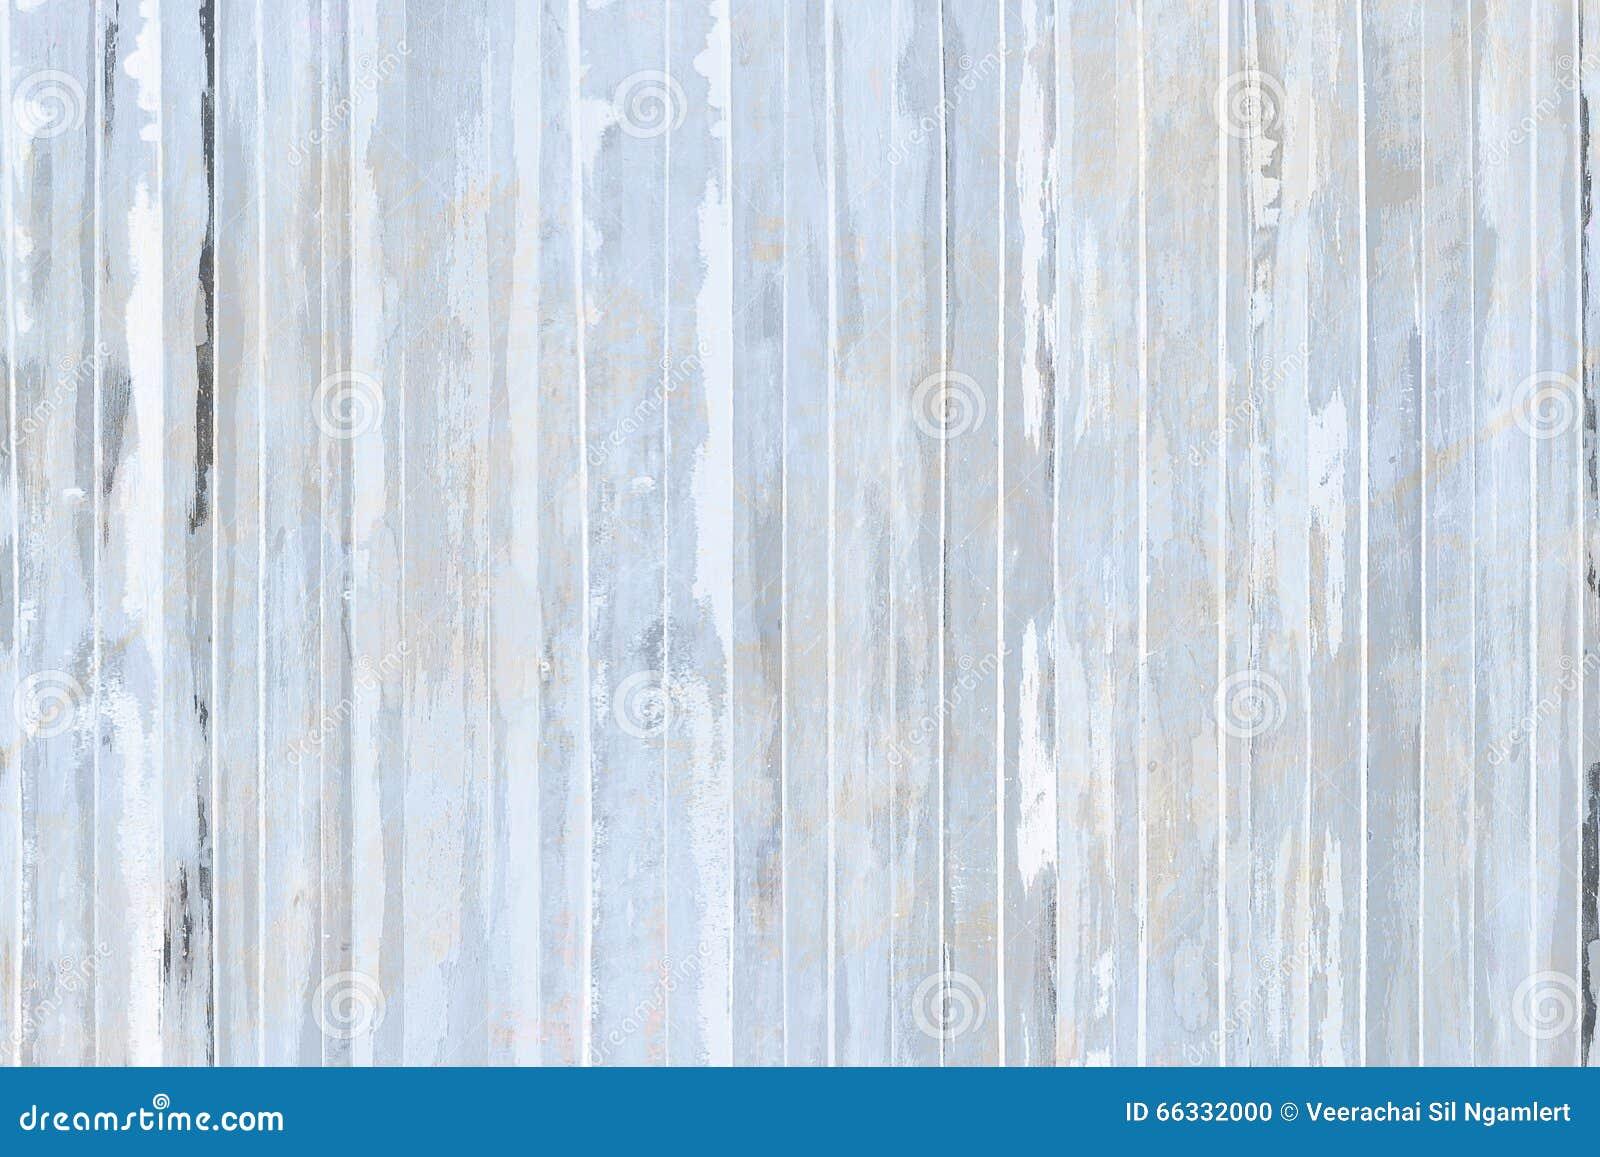 Background Light Wood Paneling Comfortable Light Stock Photo